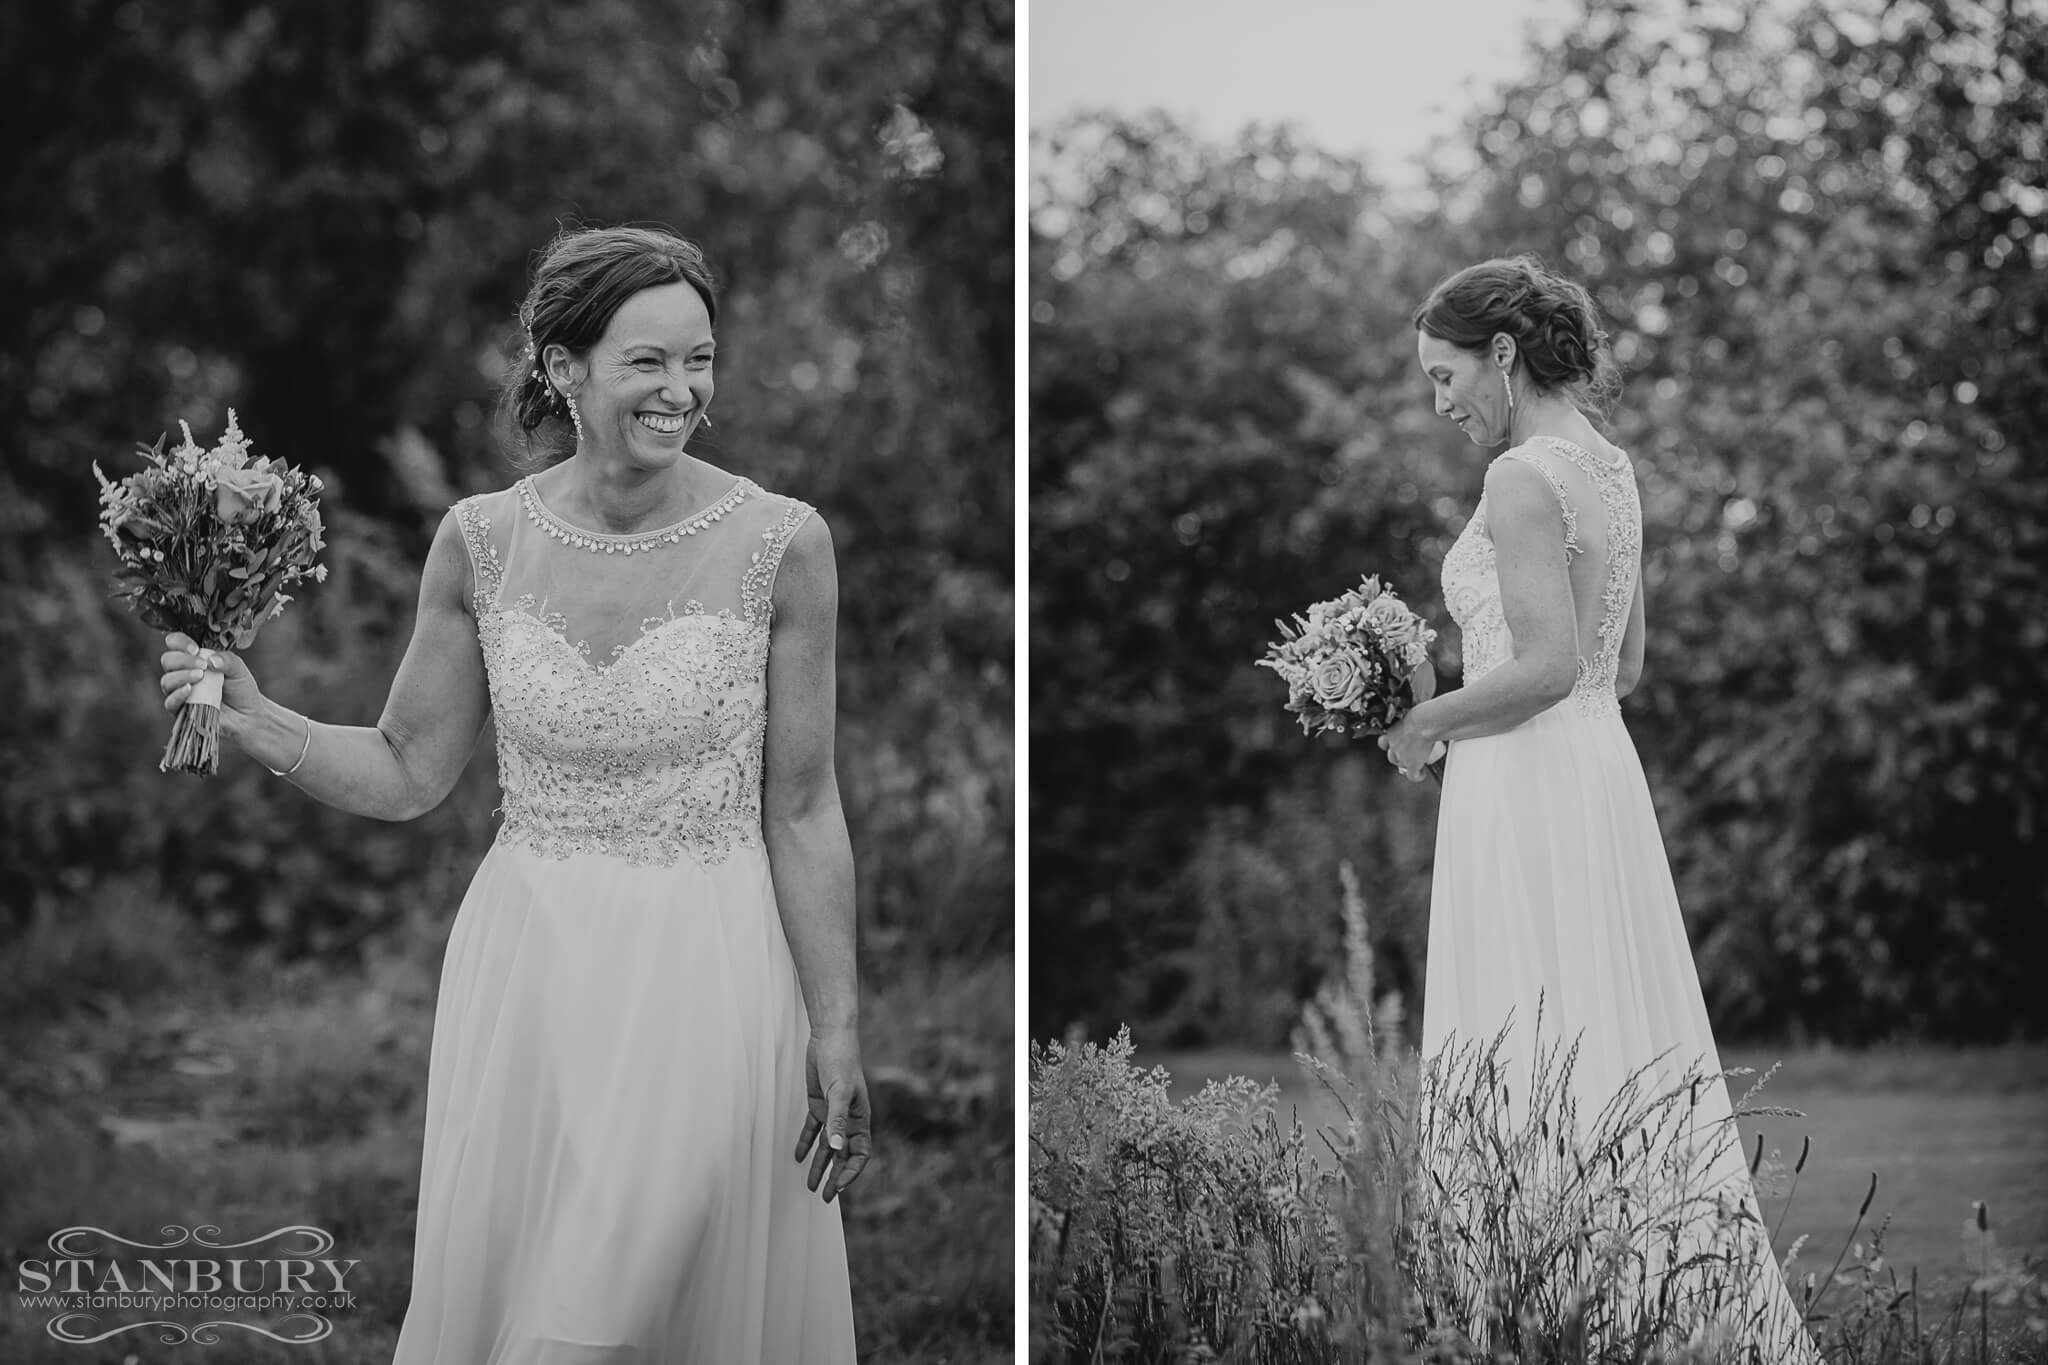 tipi-festival-bride-groom-wedding-photography-lancashire-stanbury-003